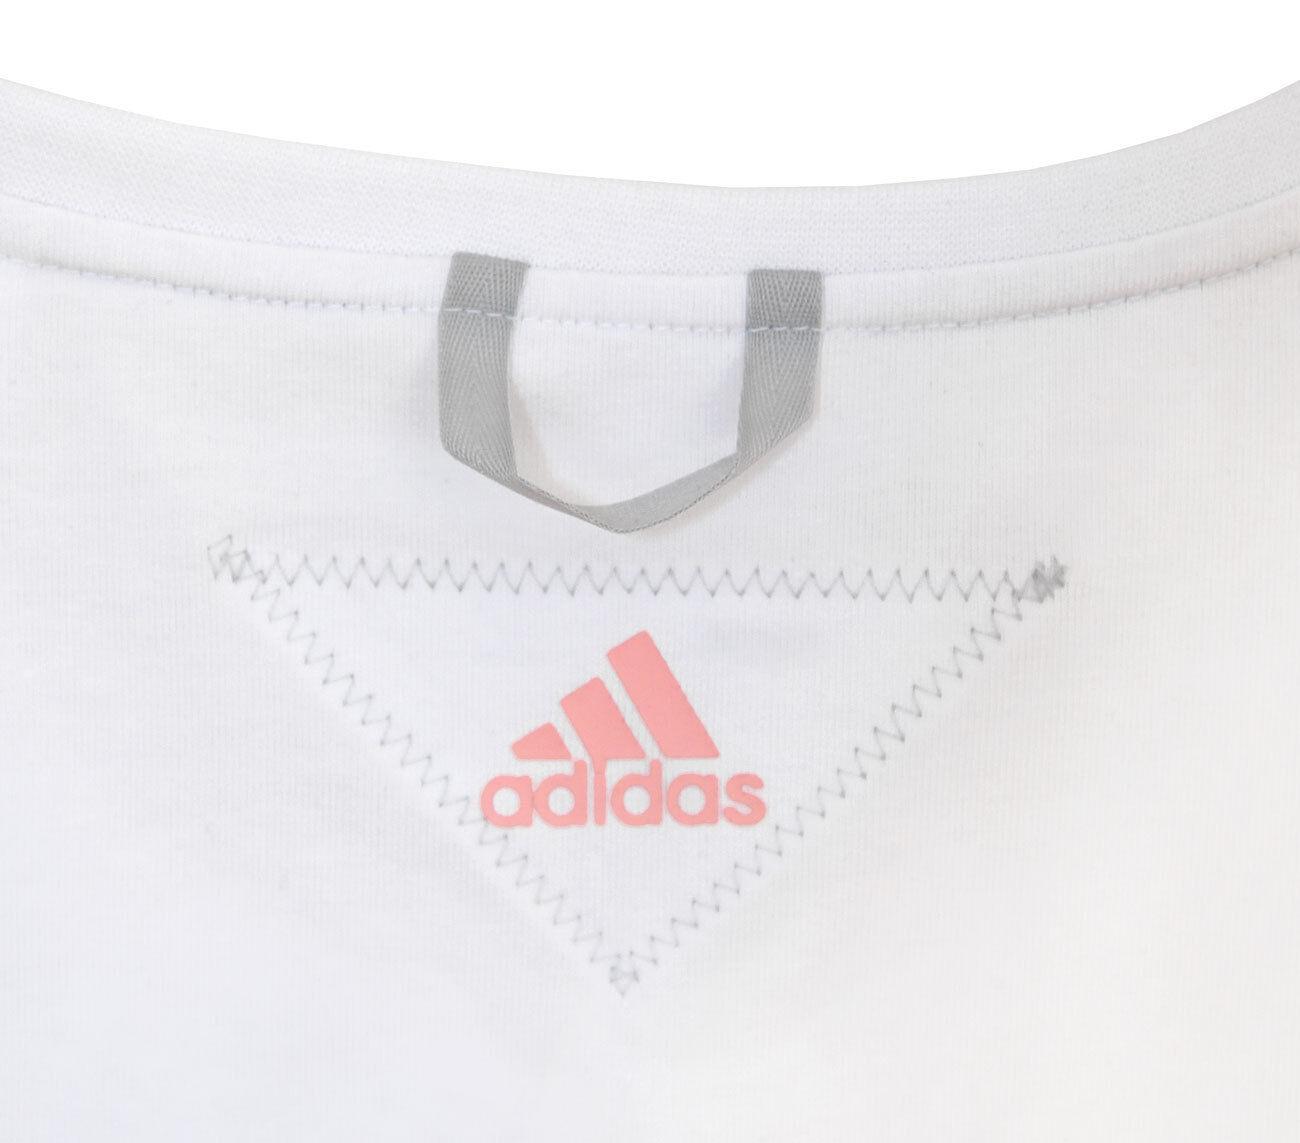 Adidas Sailing Performance Logo Shirt damen T-Shirt Outdoor Outdoor Outdoor Sport Shirt Damen  | Sale Düsseldorf  859597